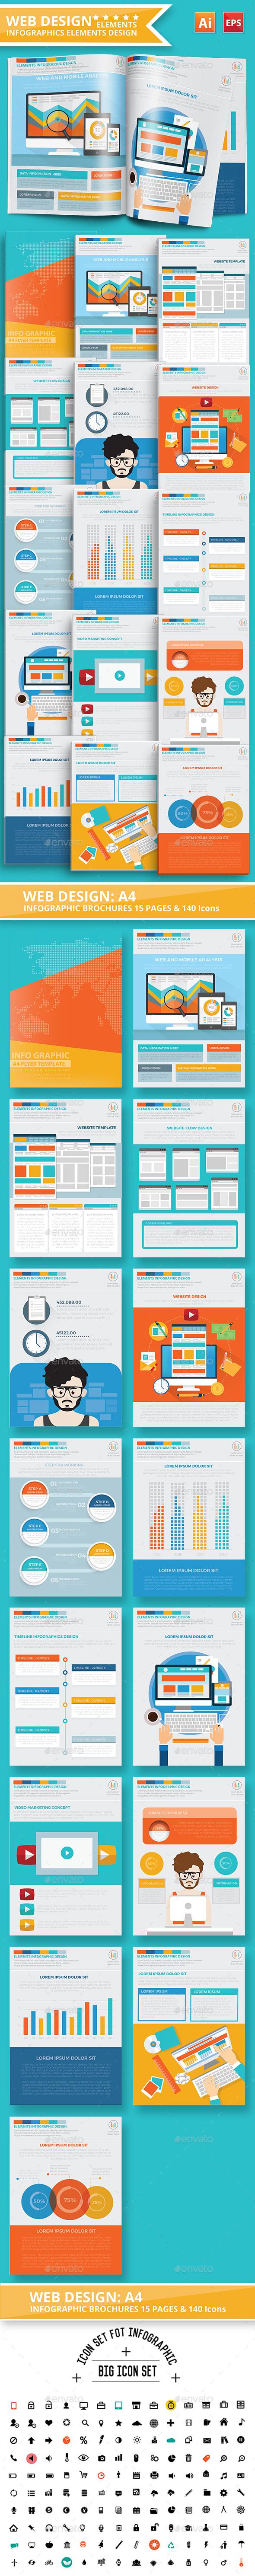 Web design infographic Design - Infographics